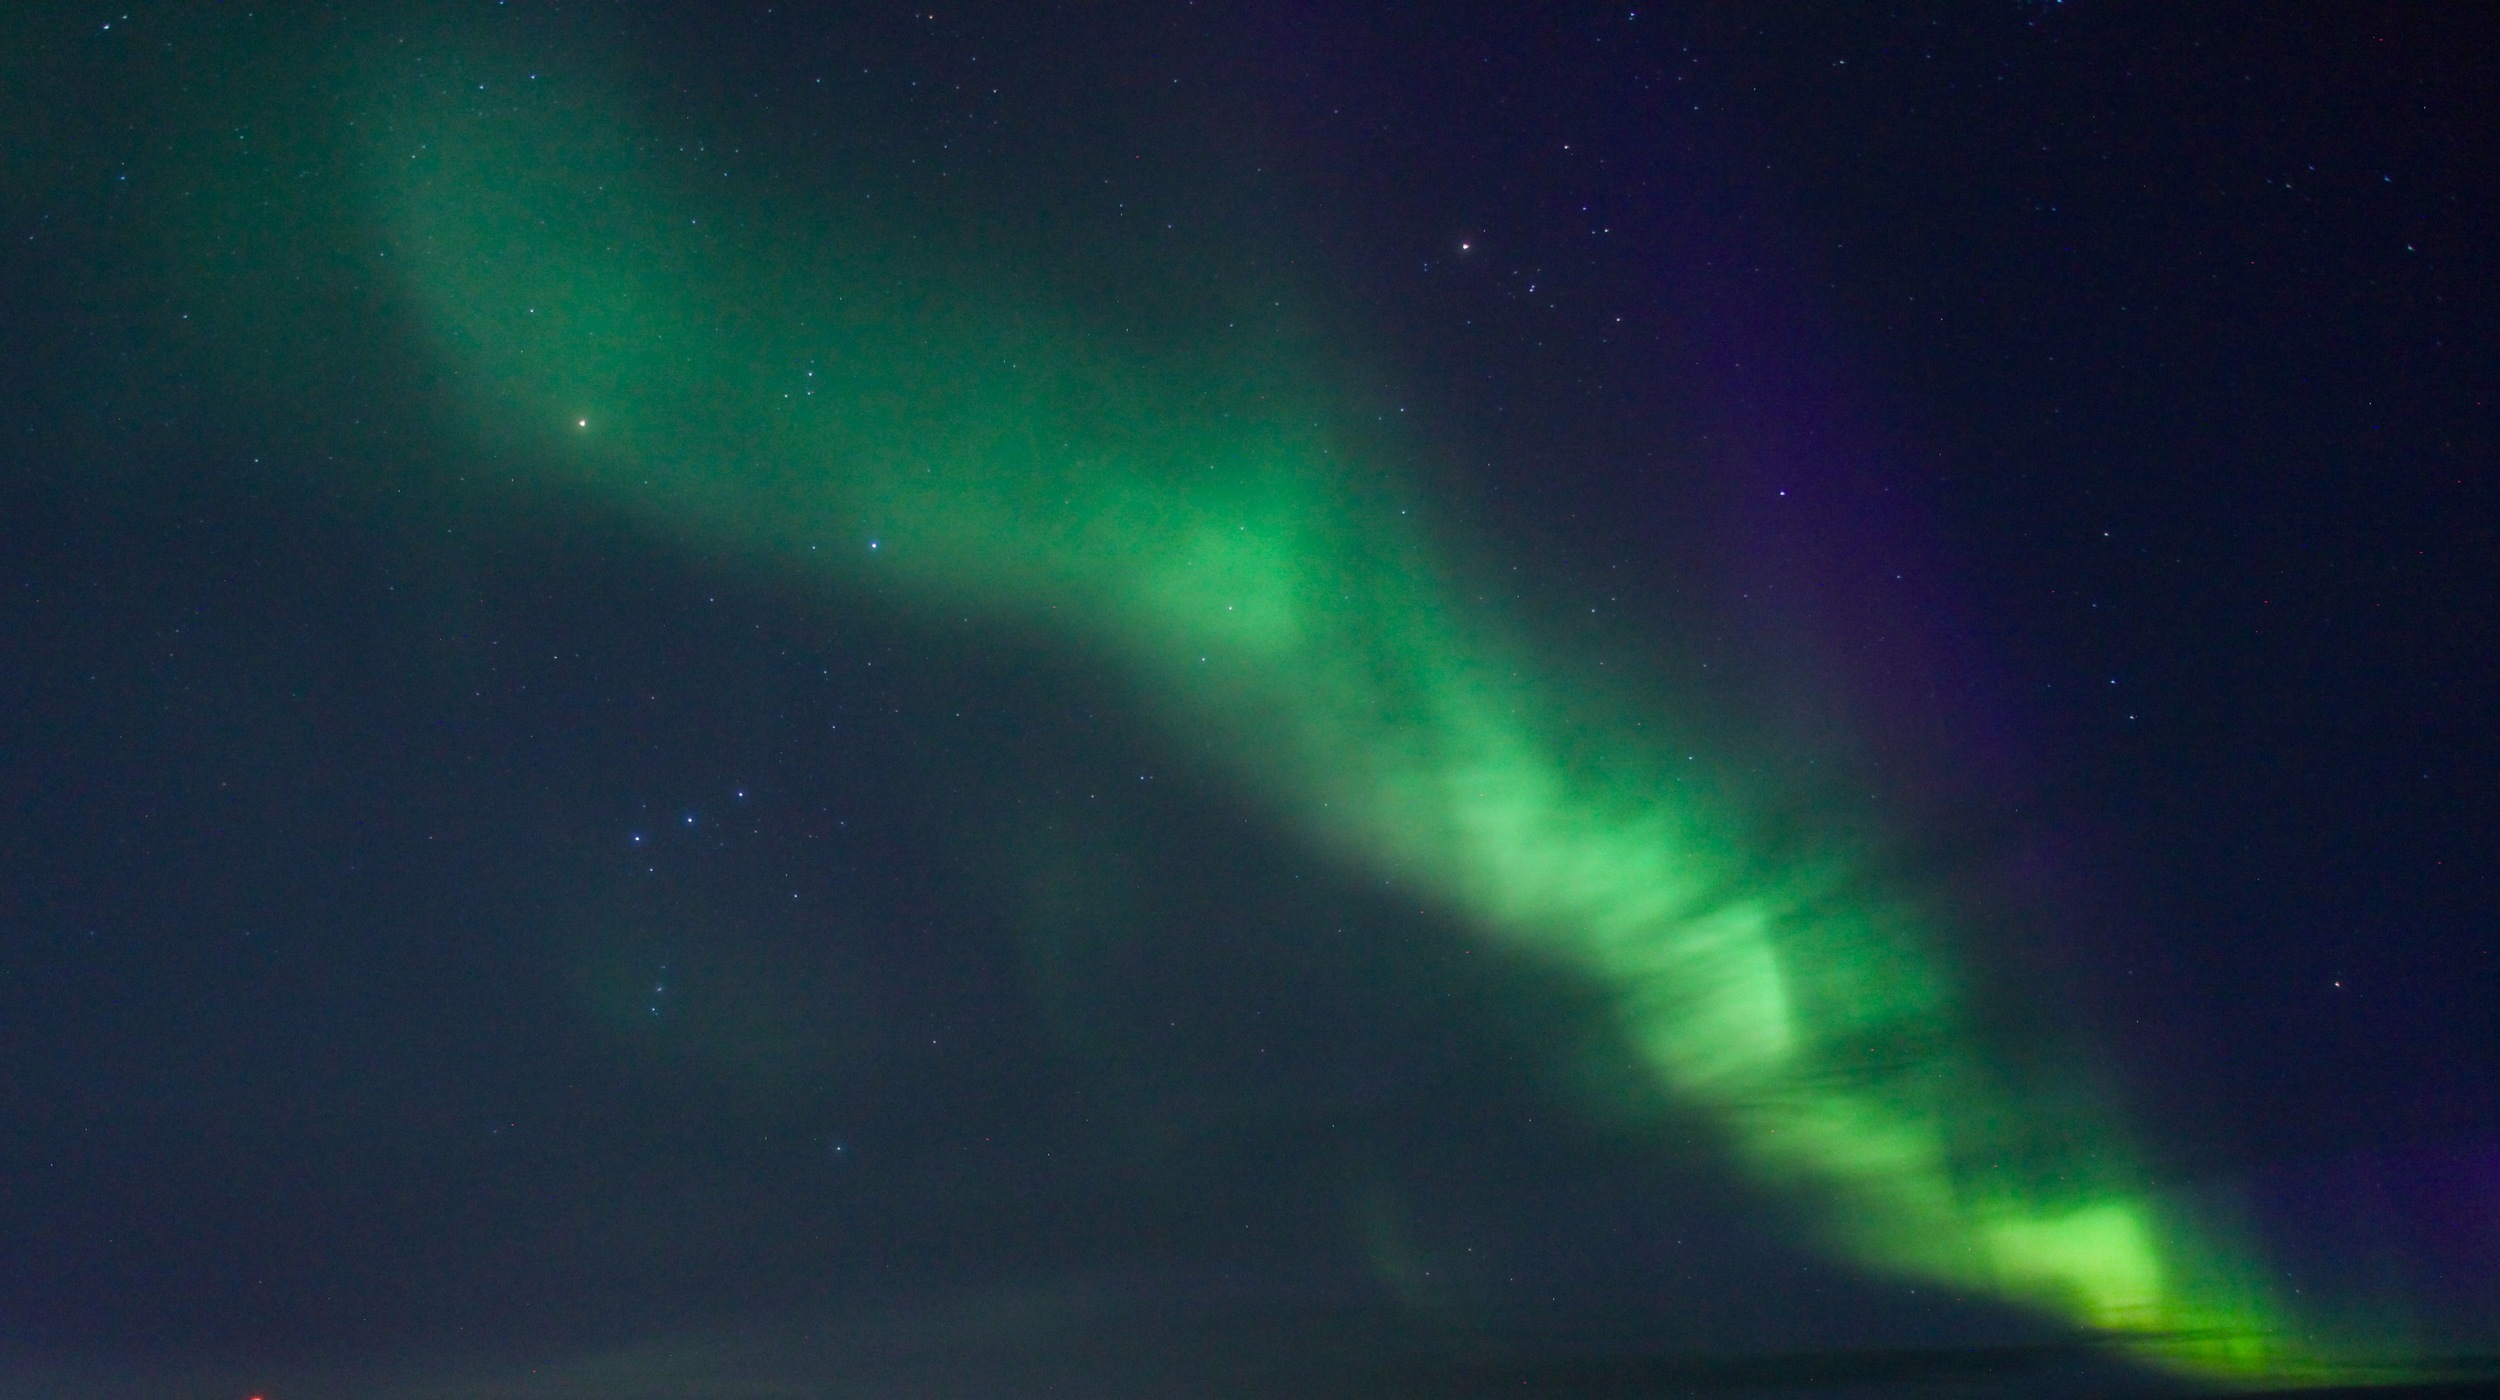 Green and purple aurora, around 9:30 PM in Ilulissat, Greenland (Photo by Andrew Evans)